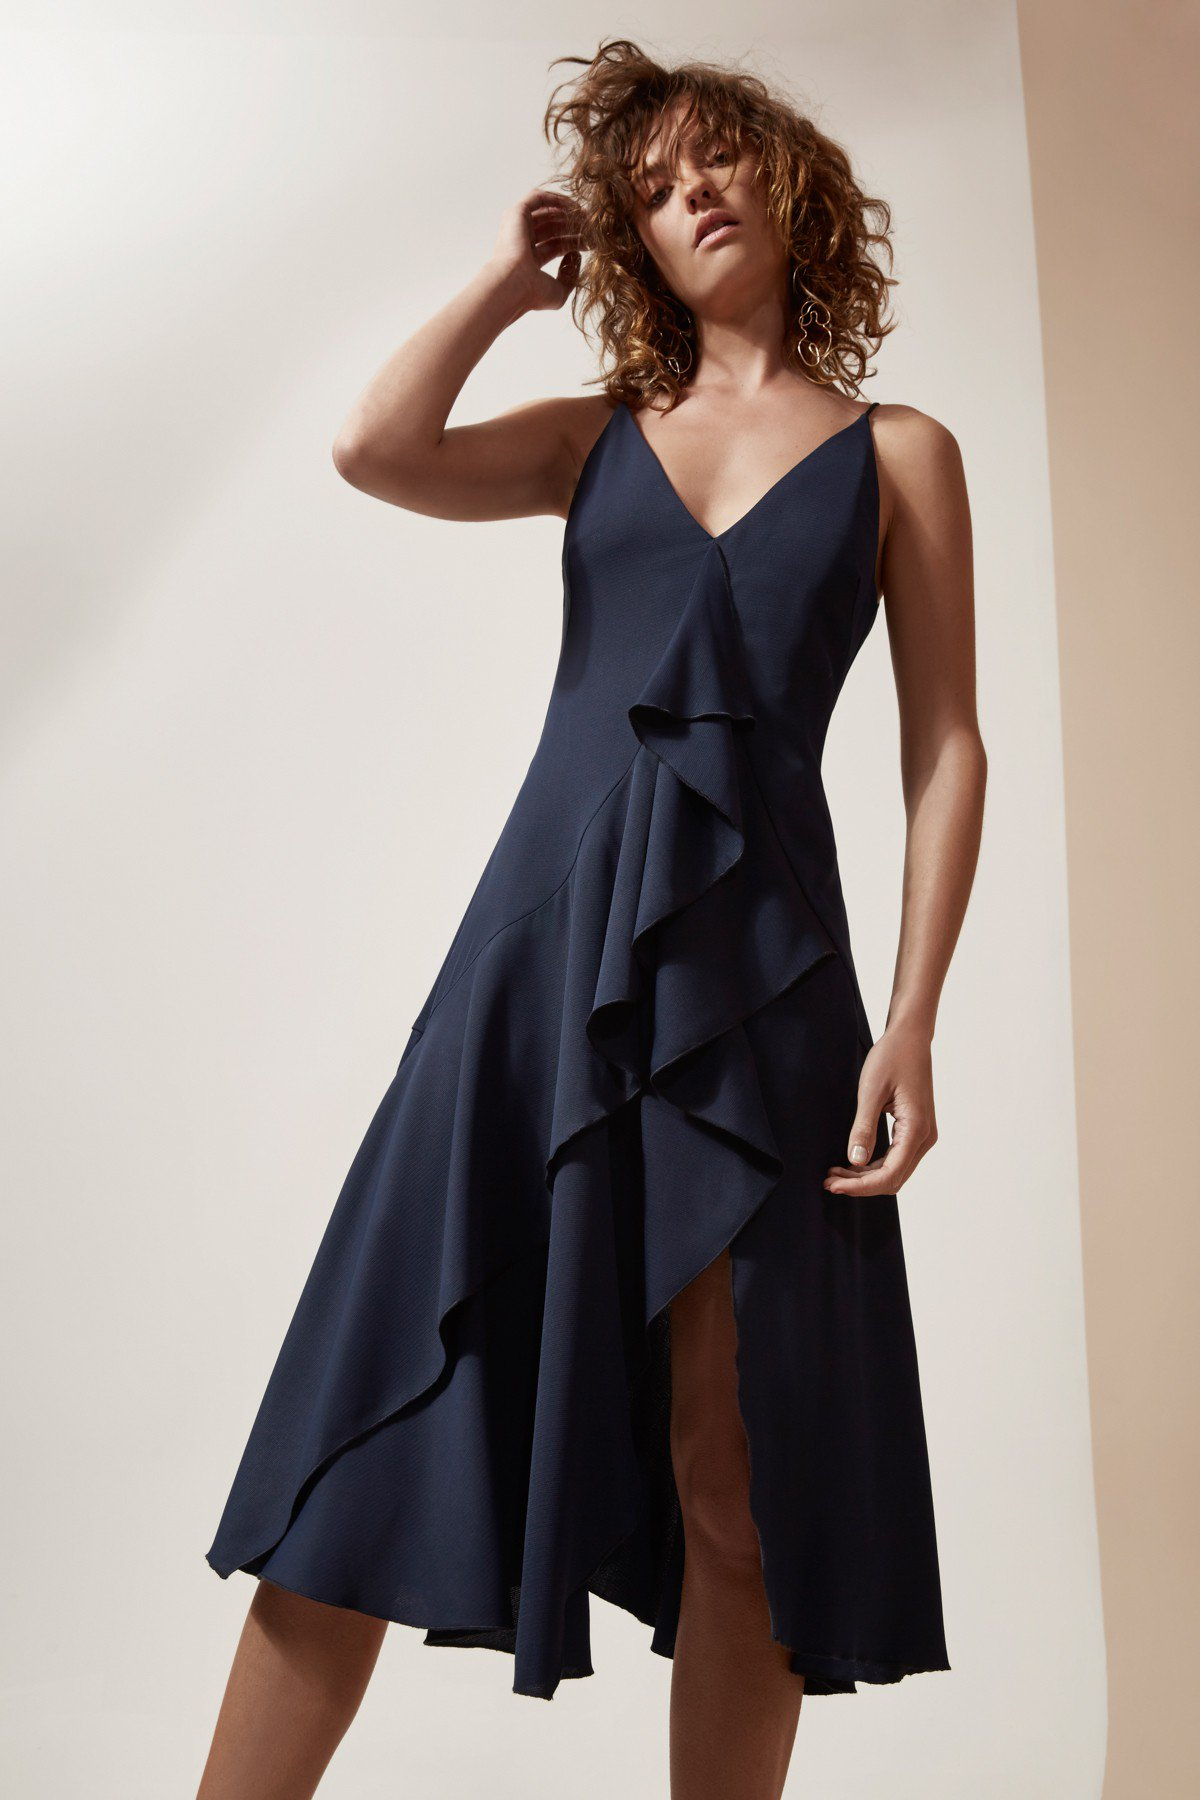 Shop C/MEO Gossamer Short Sleeve Dress.